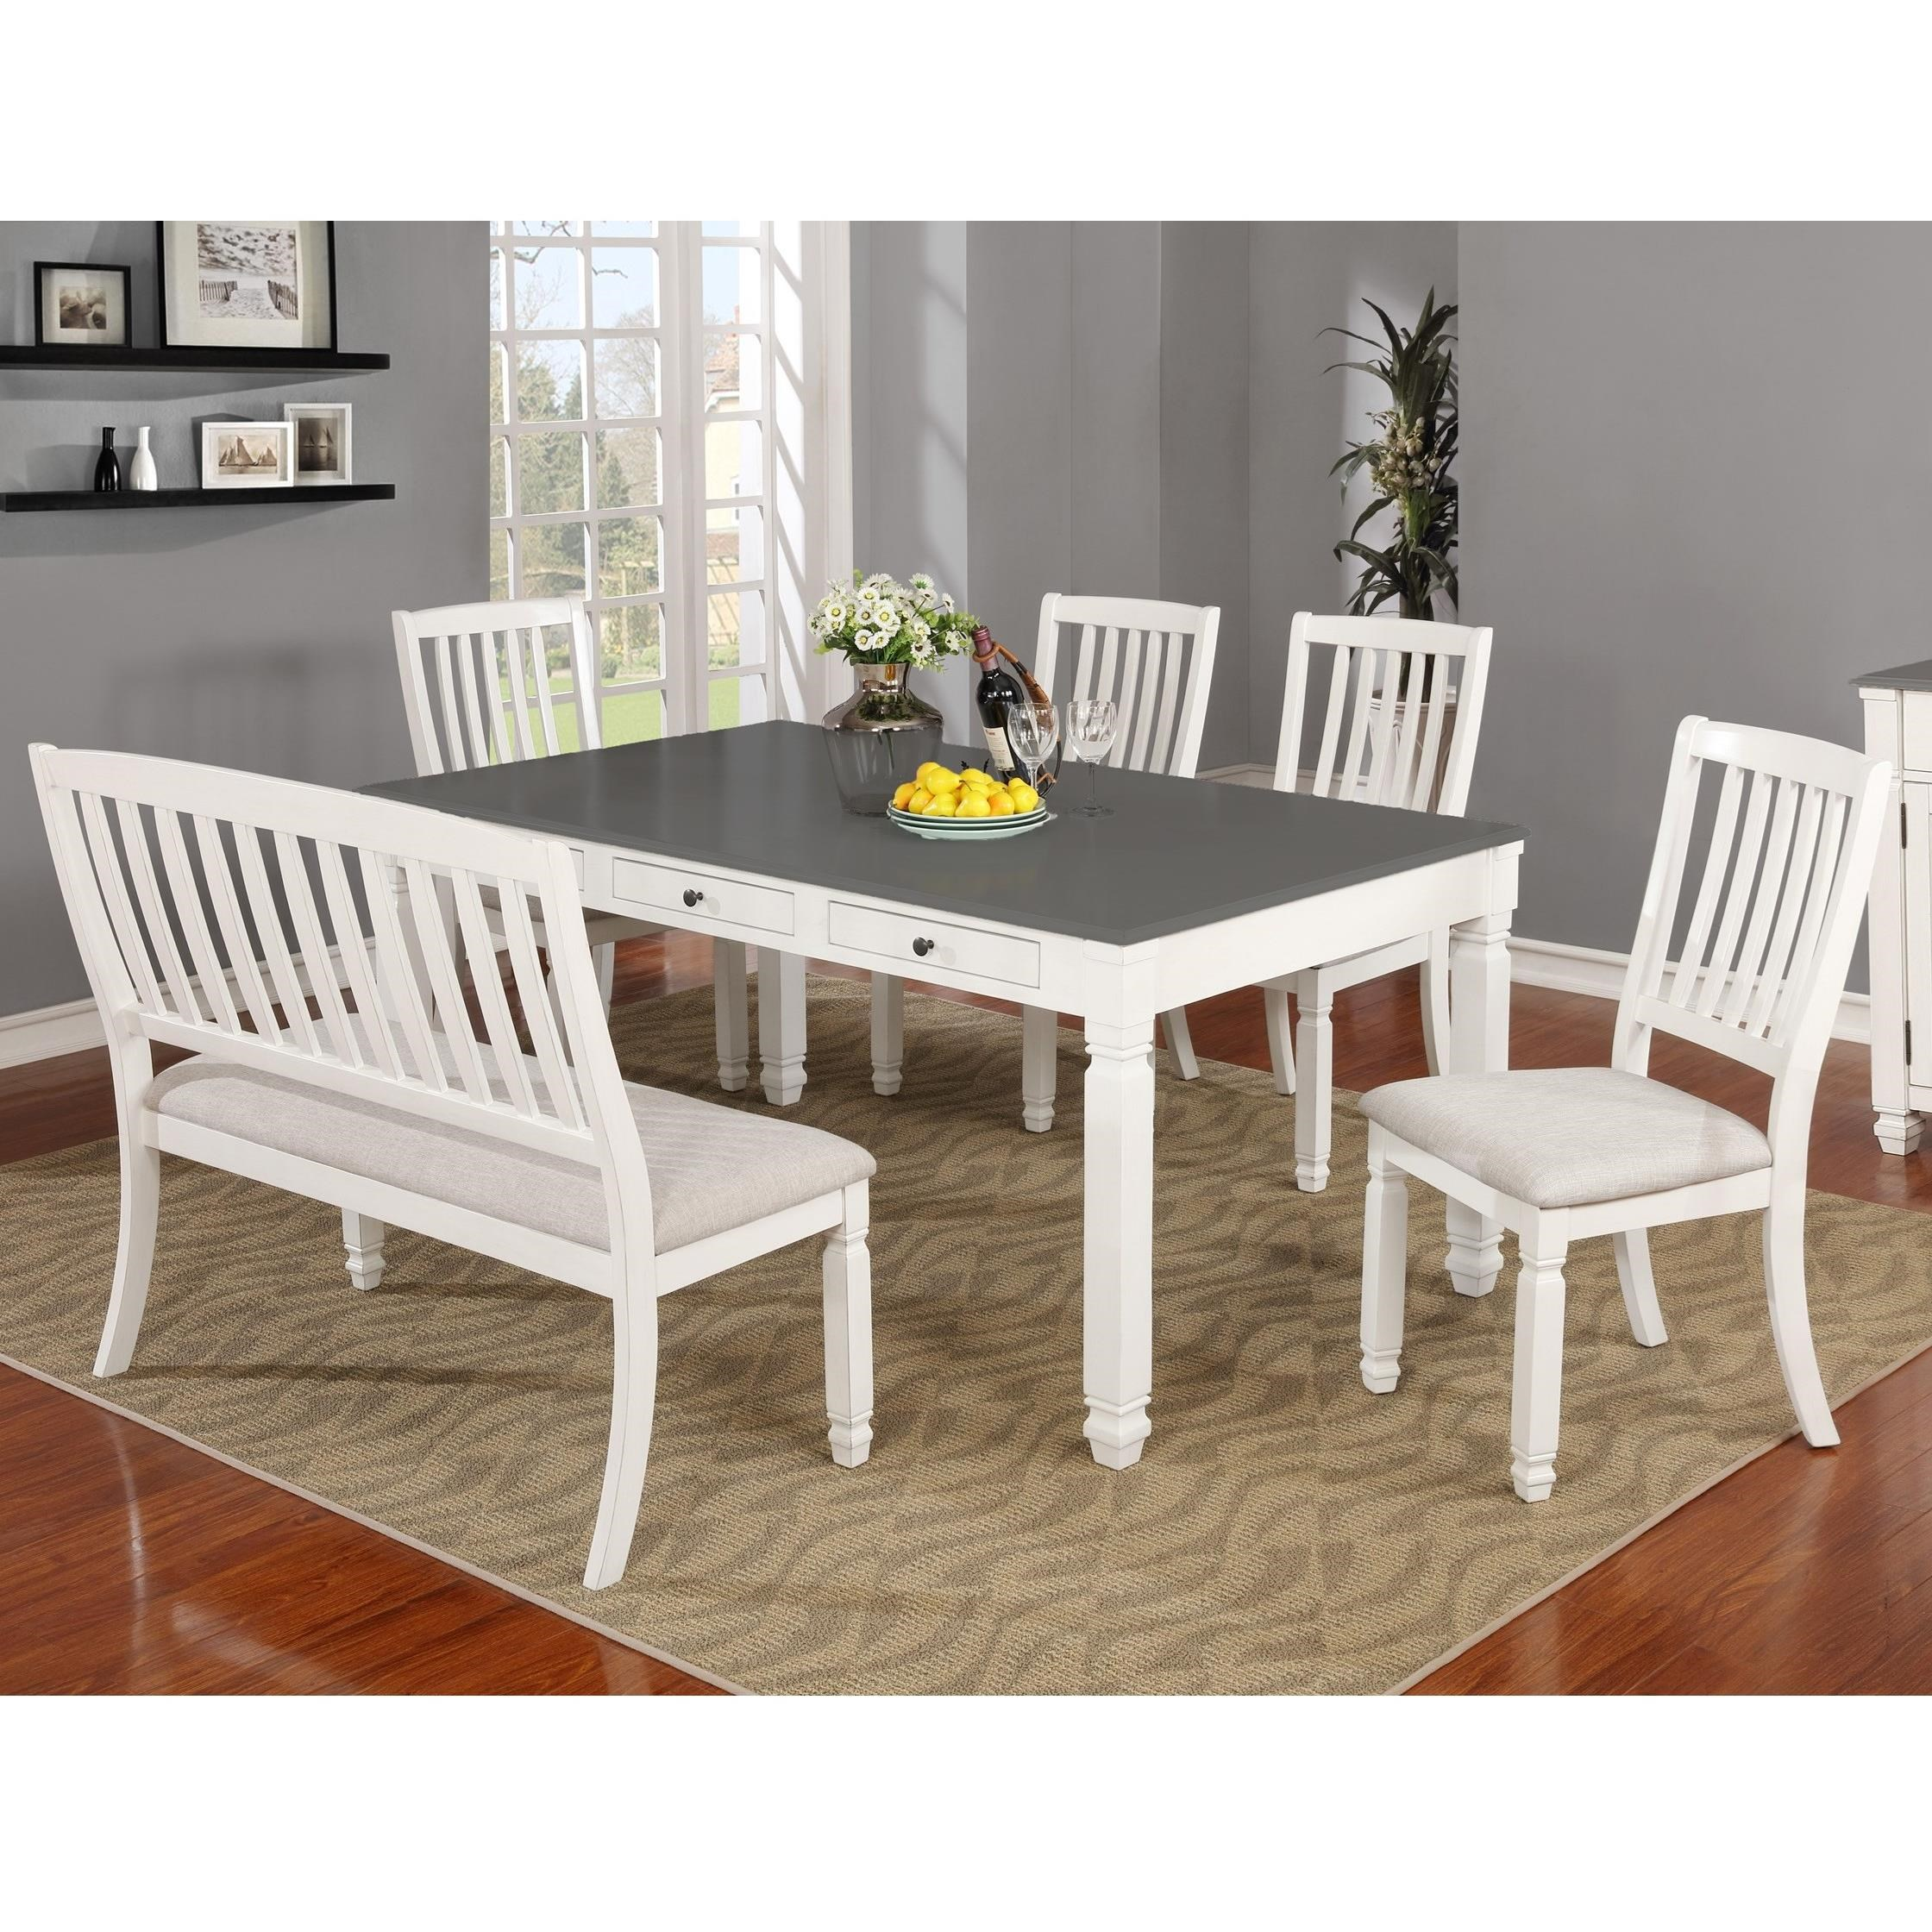 6-Piece Table Set